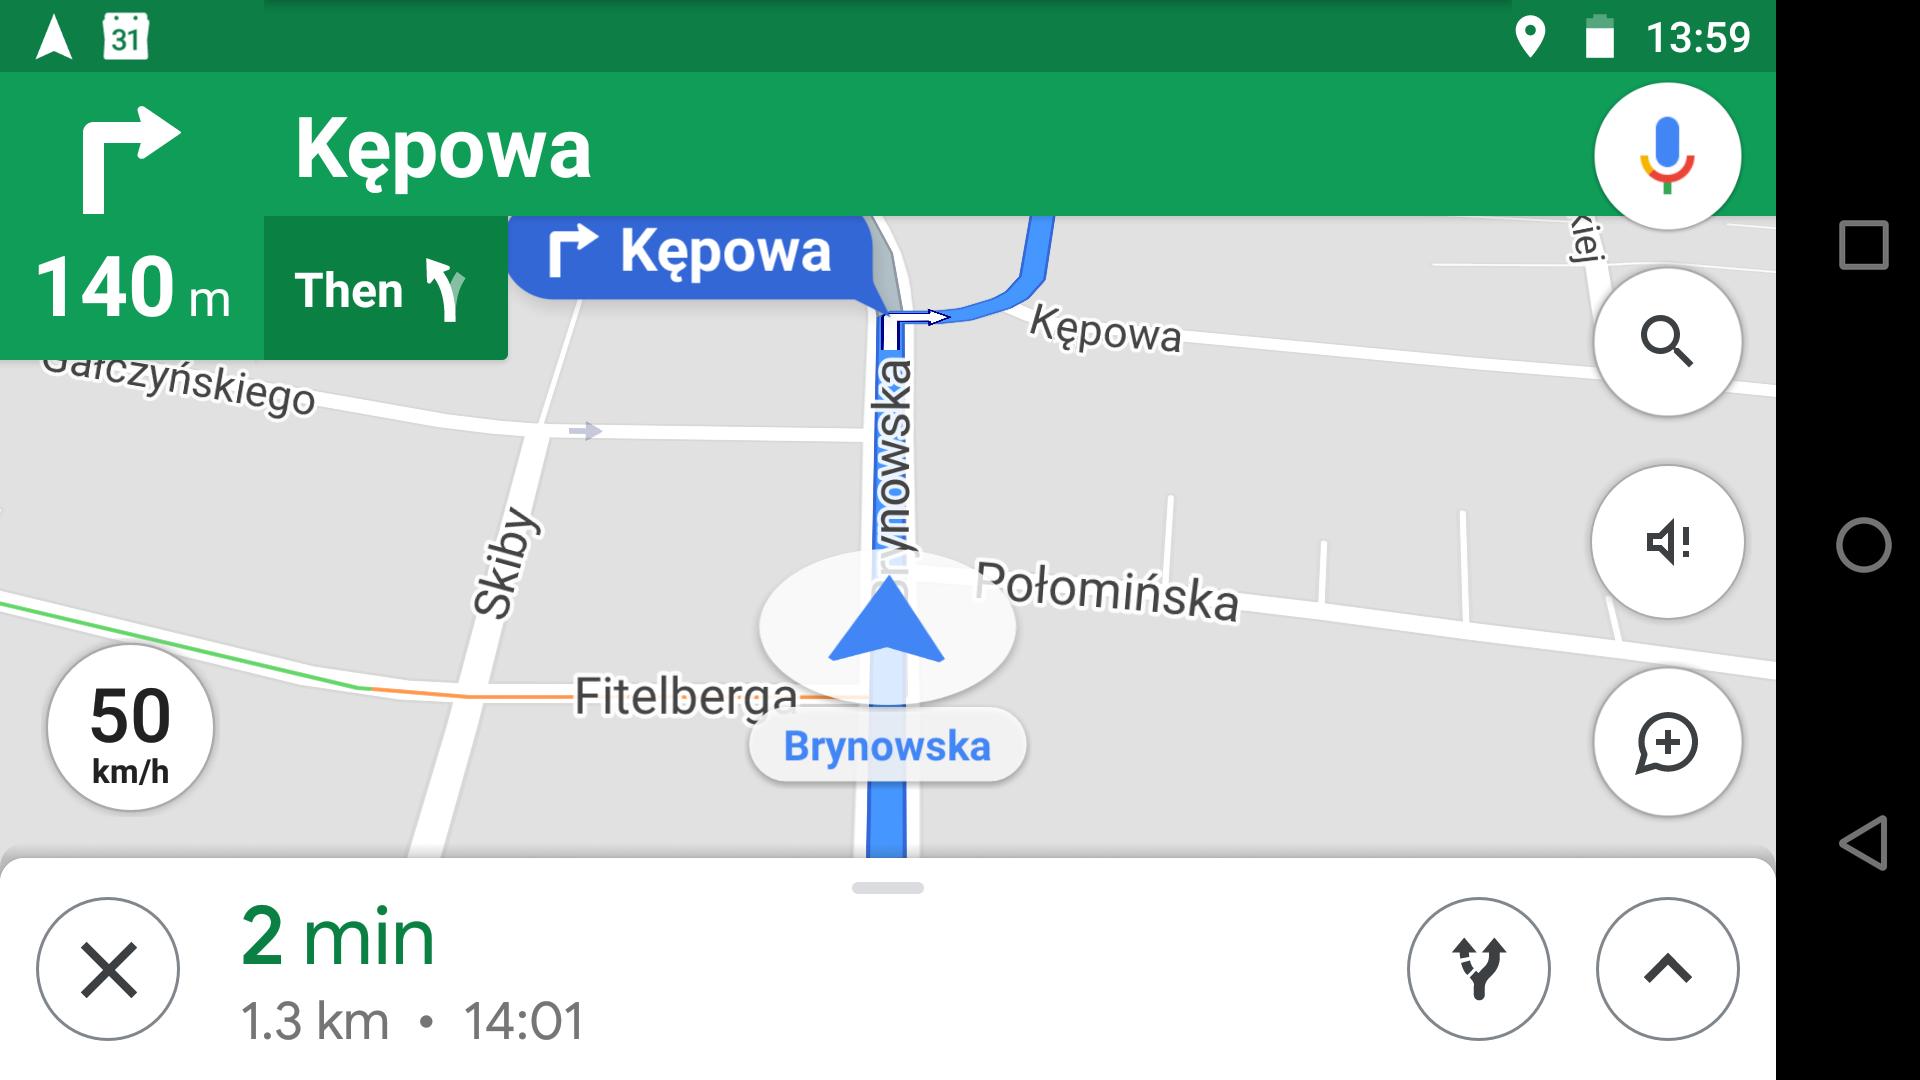 where is eta application processed